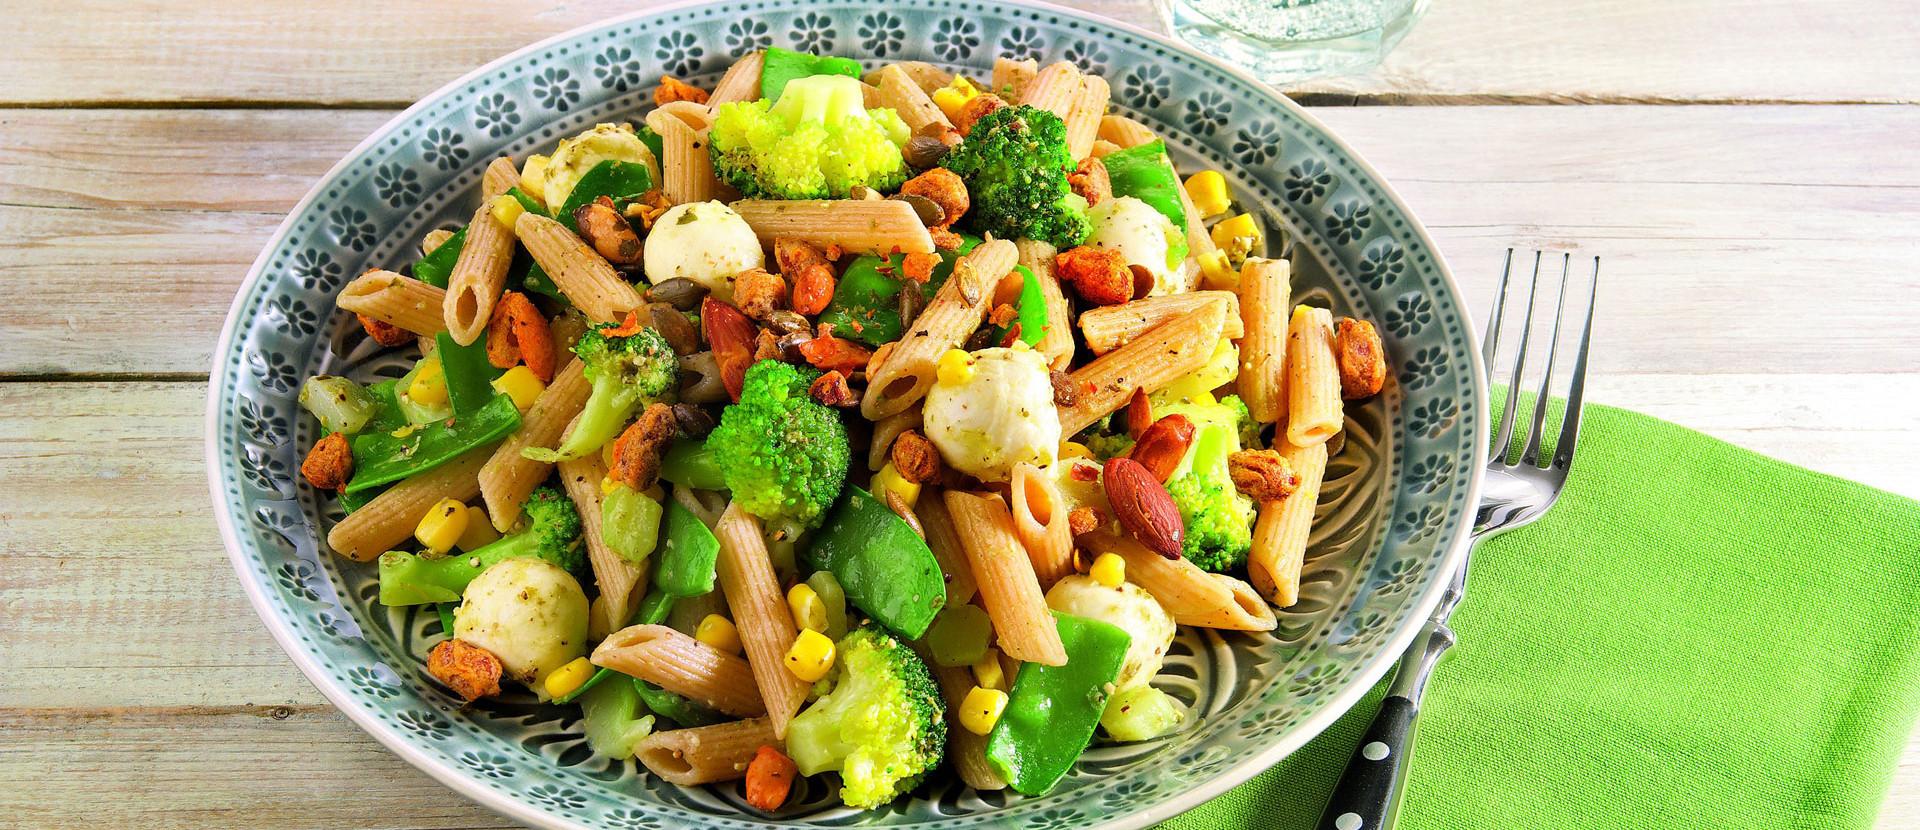 Brokkoli-Nudelsalat